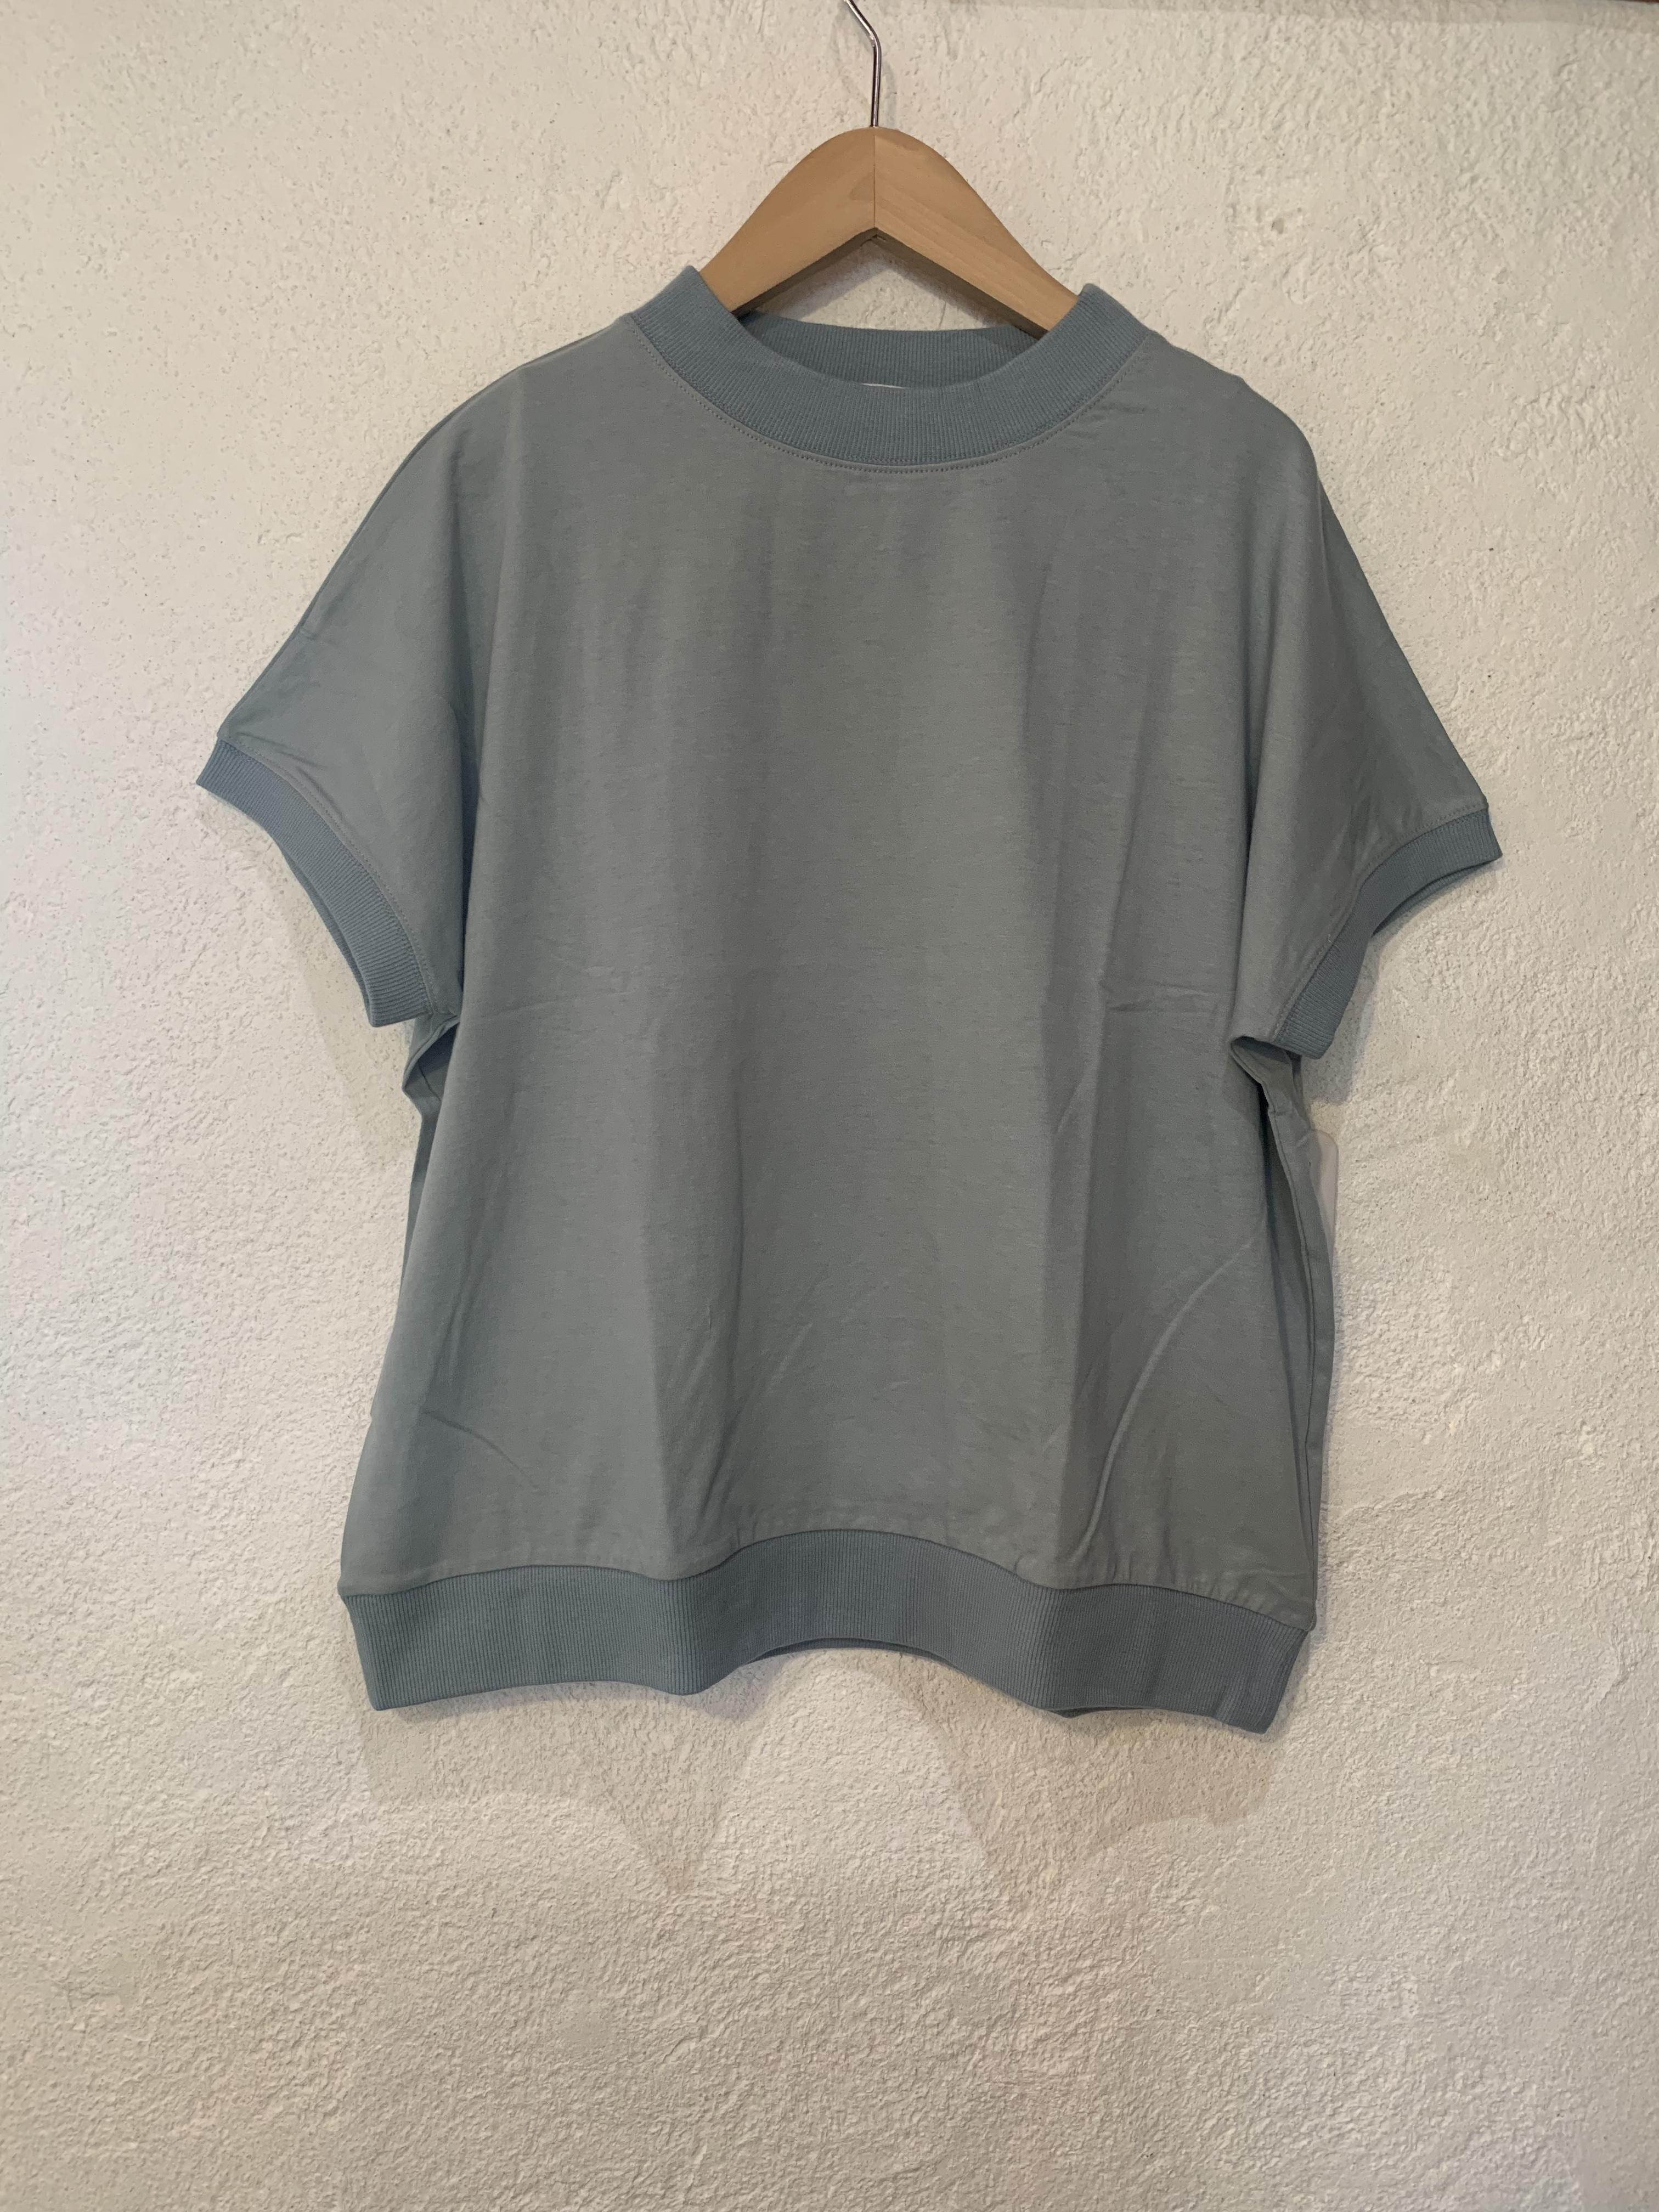 nachukara/リブドッキング半袖Tシャツ ミント